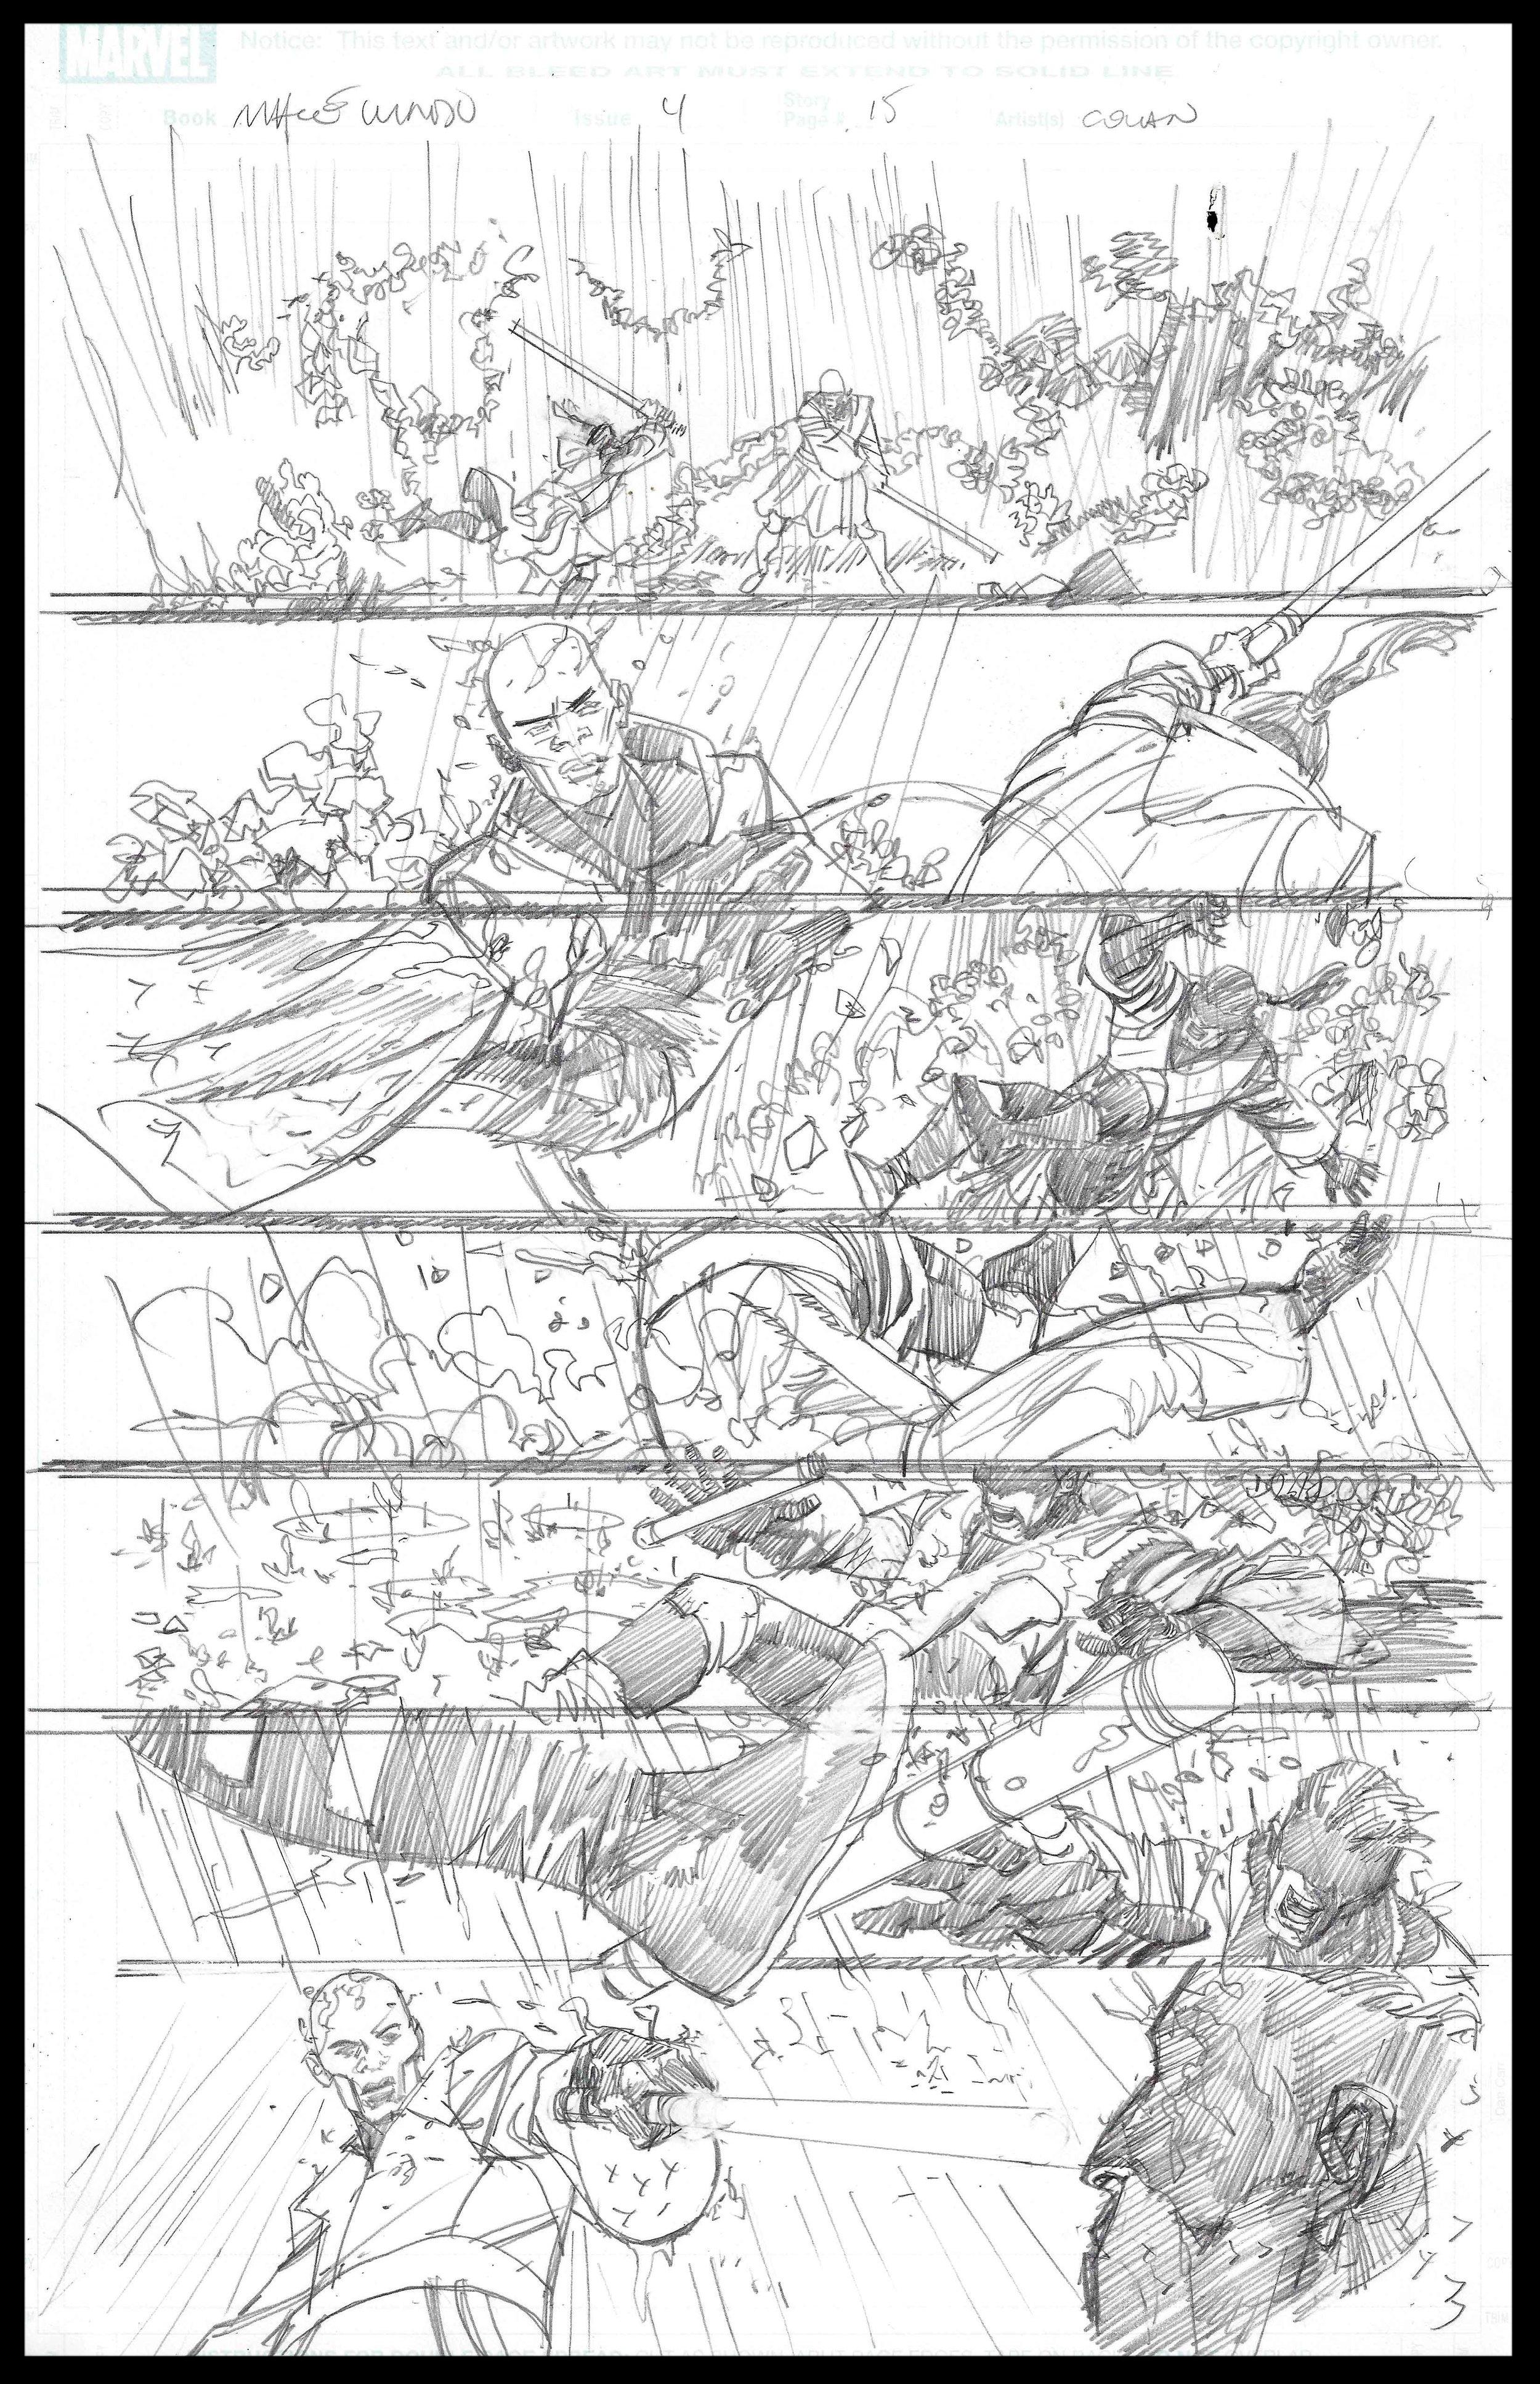 Mace Windu #4 - Page 15 - Pencils